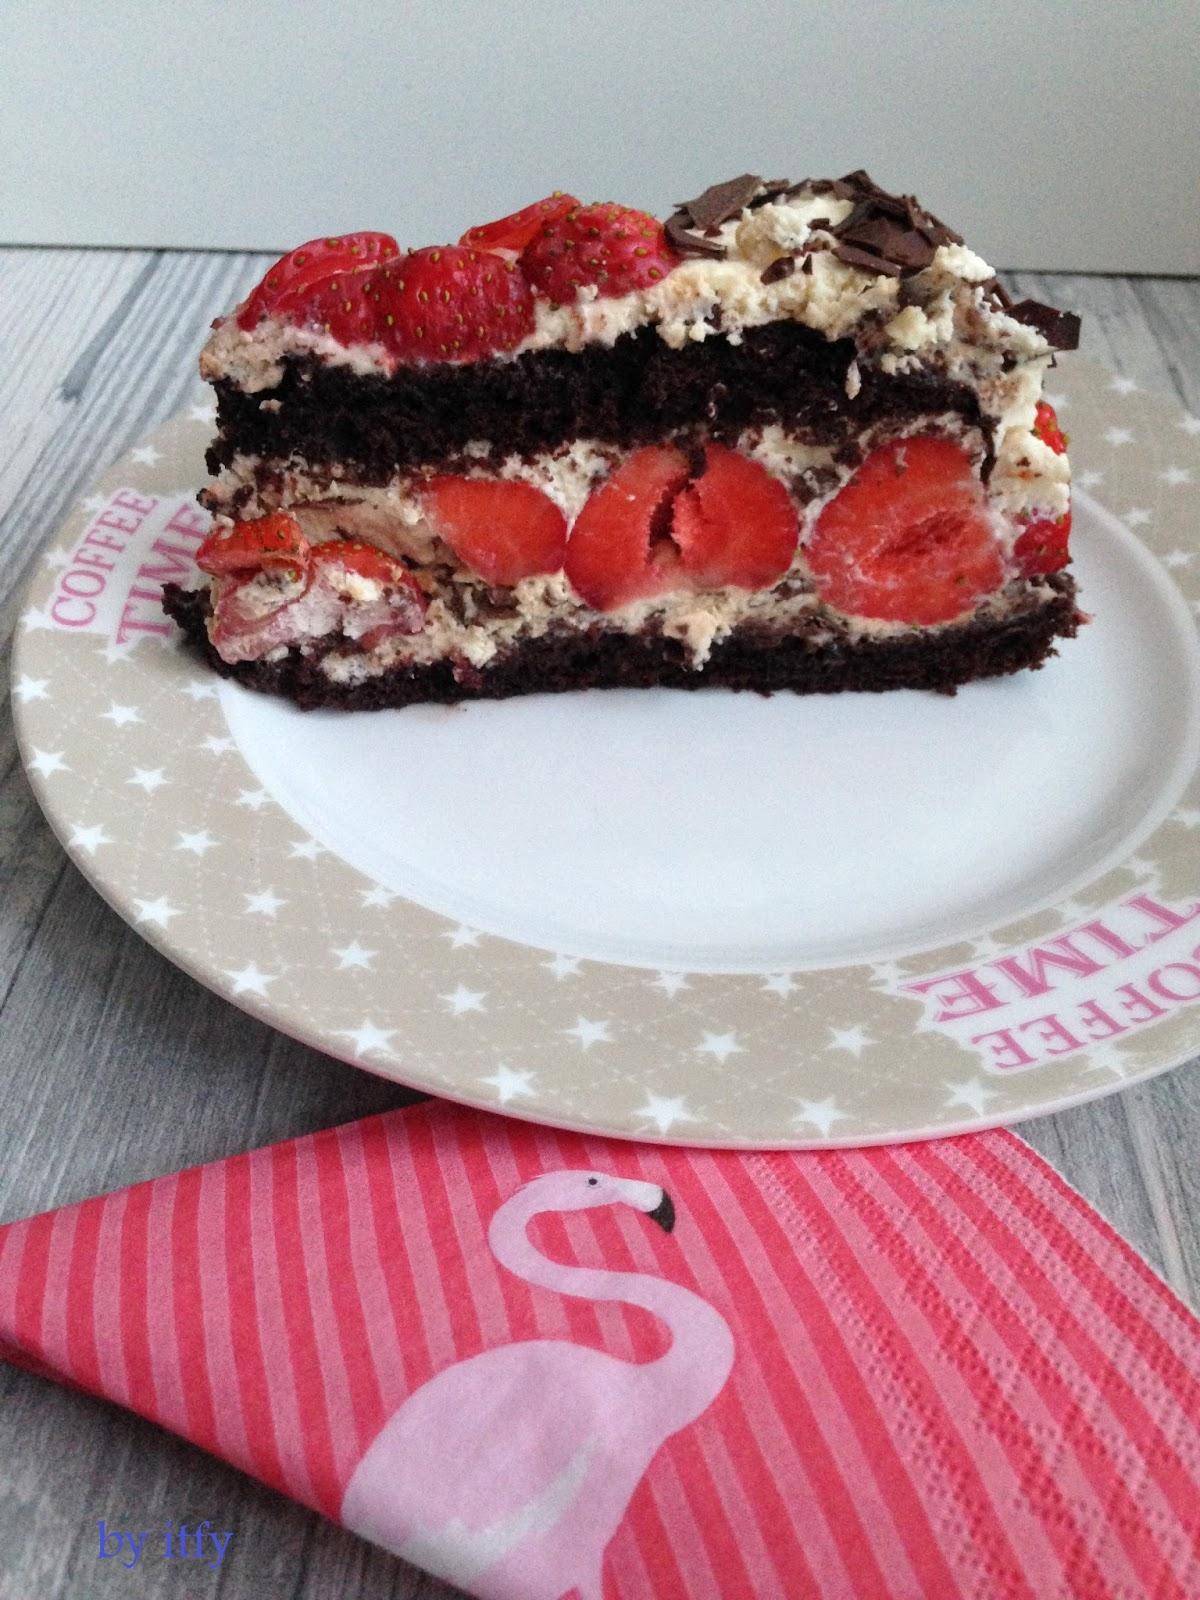 I TEST FOR YOU :-): Sonntagskuchen: Erdbeere Stracciatella Traum